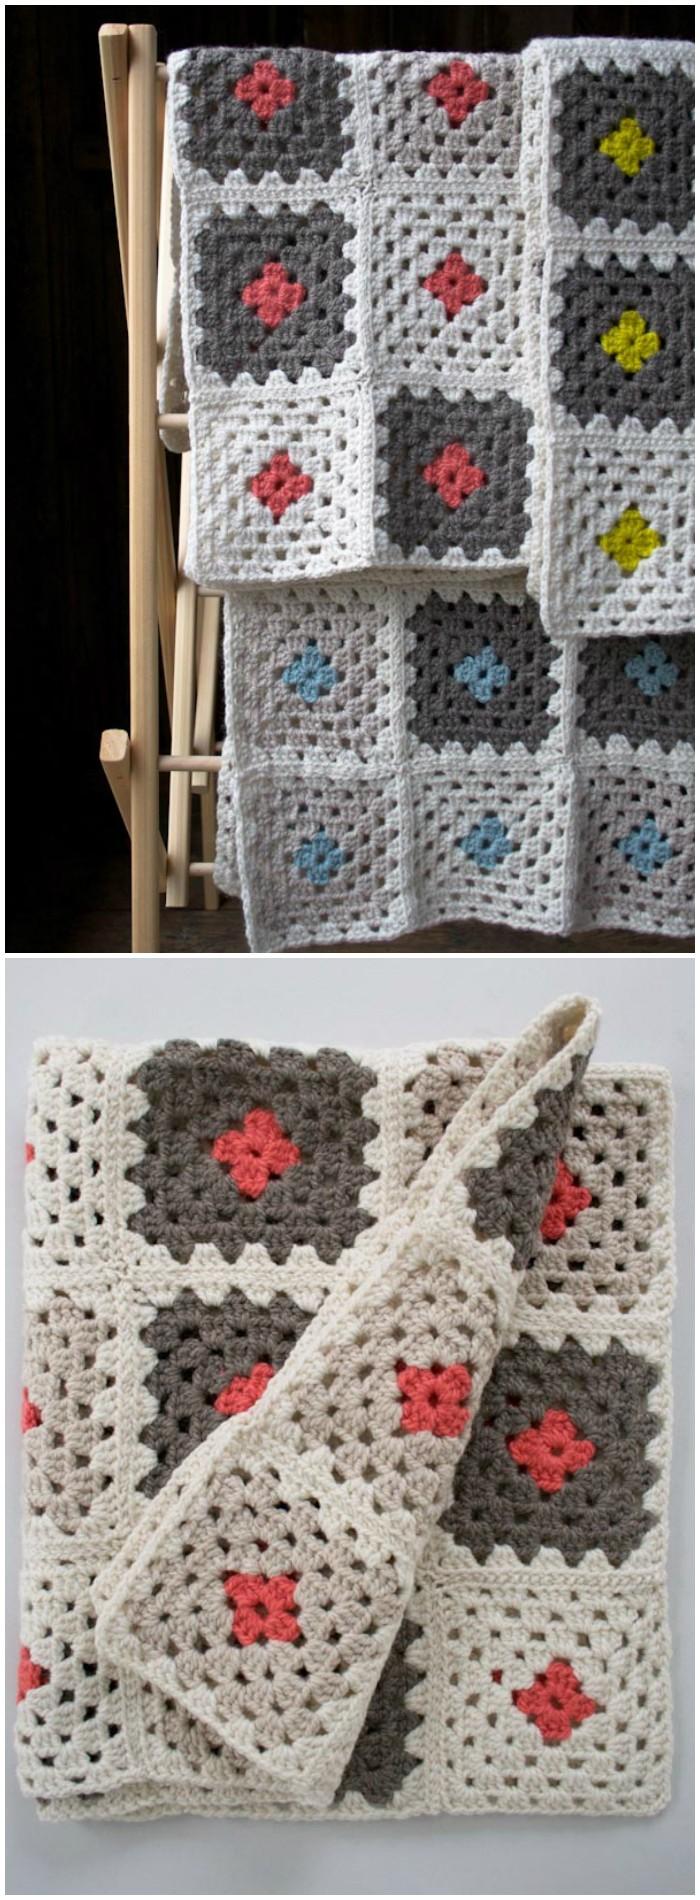 Crochet a Granny Square Blanket Kit